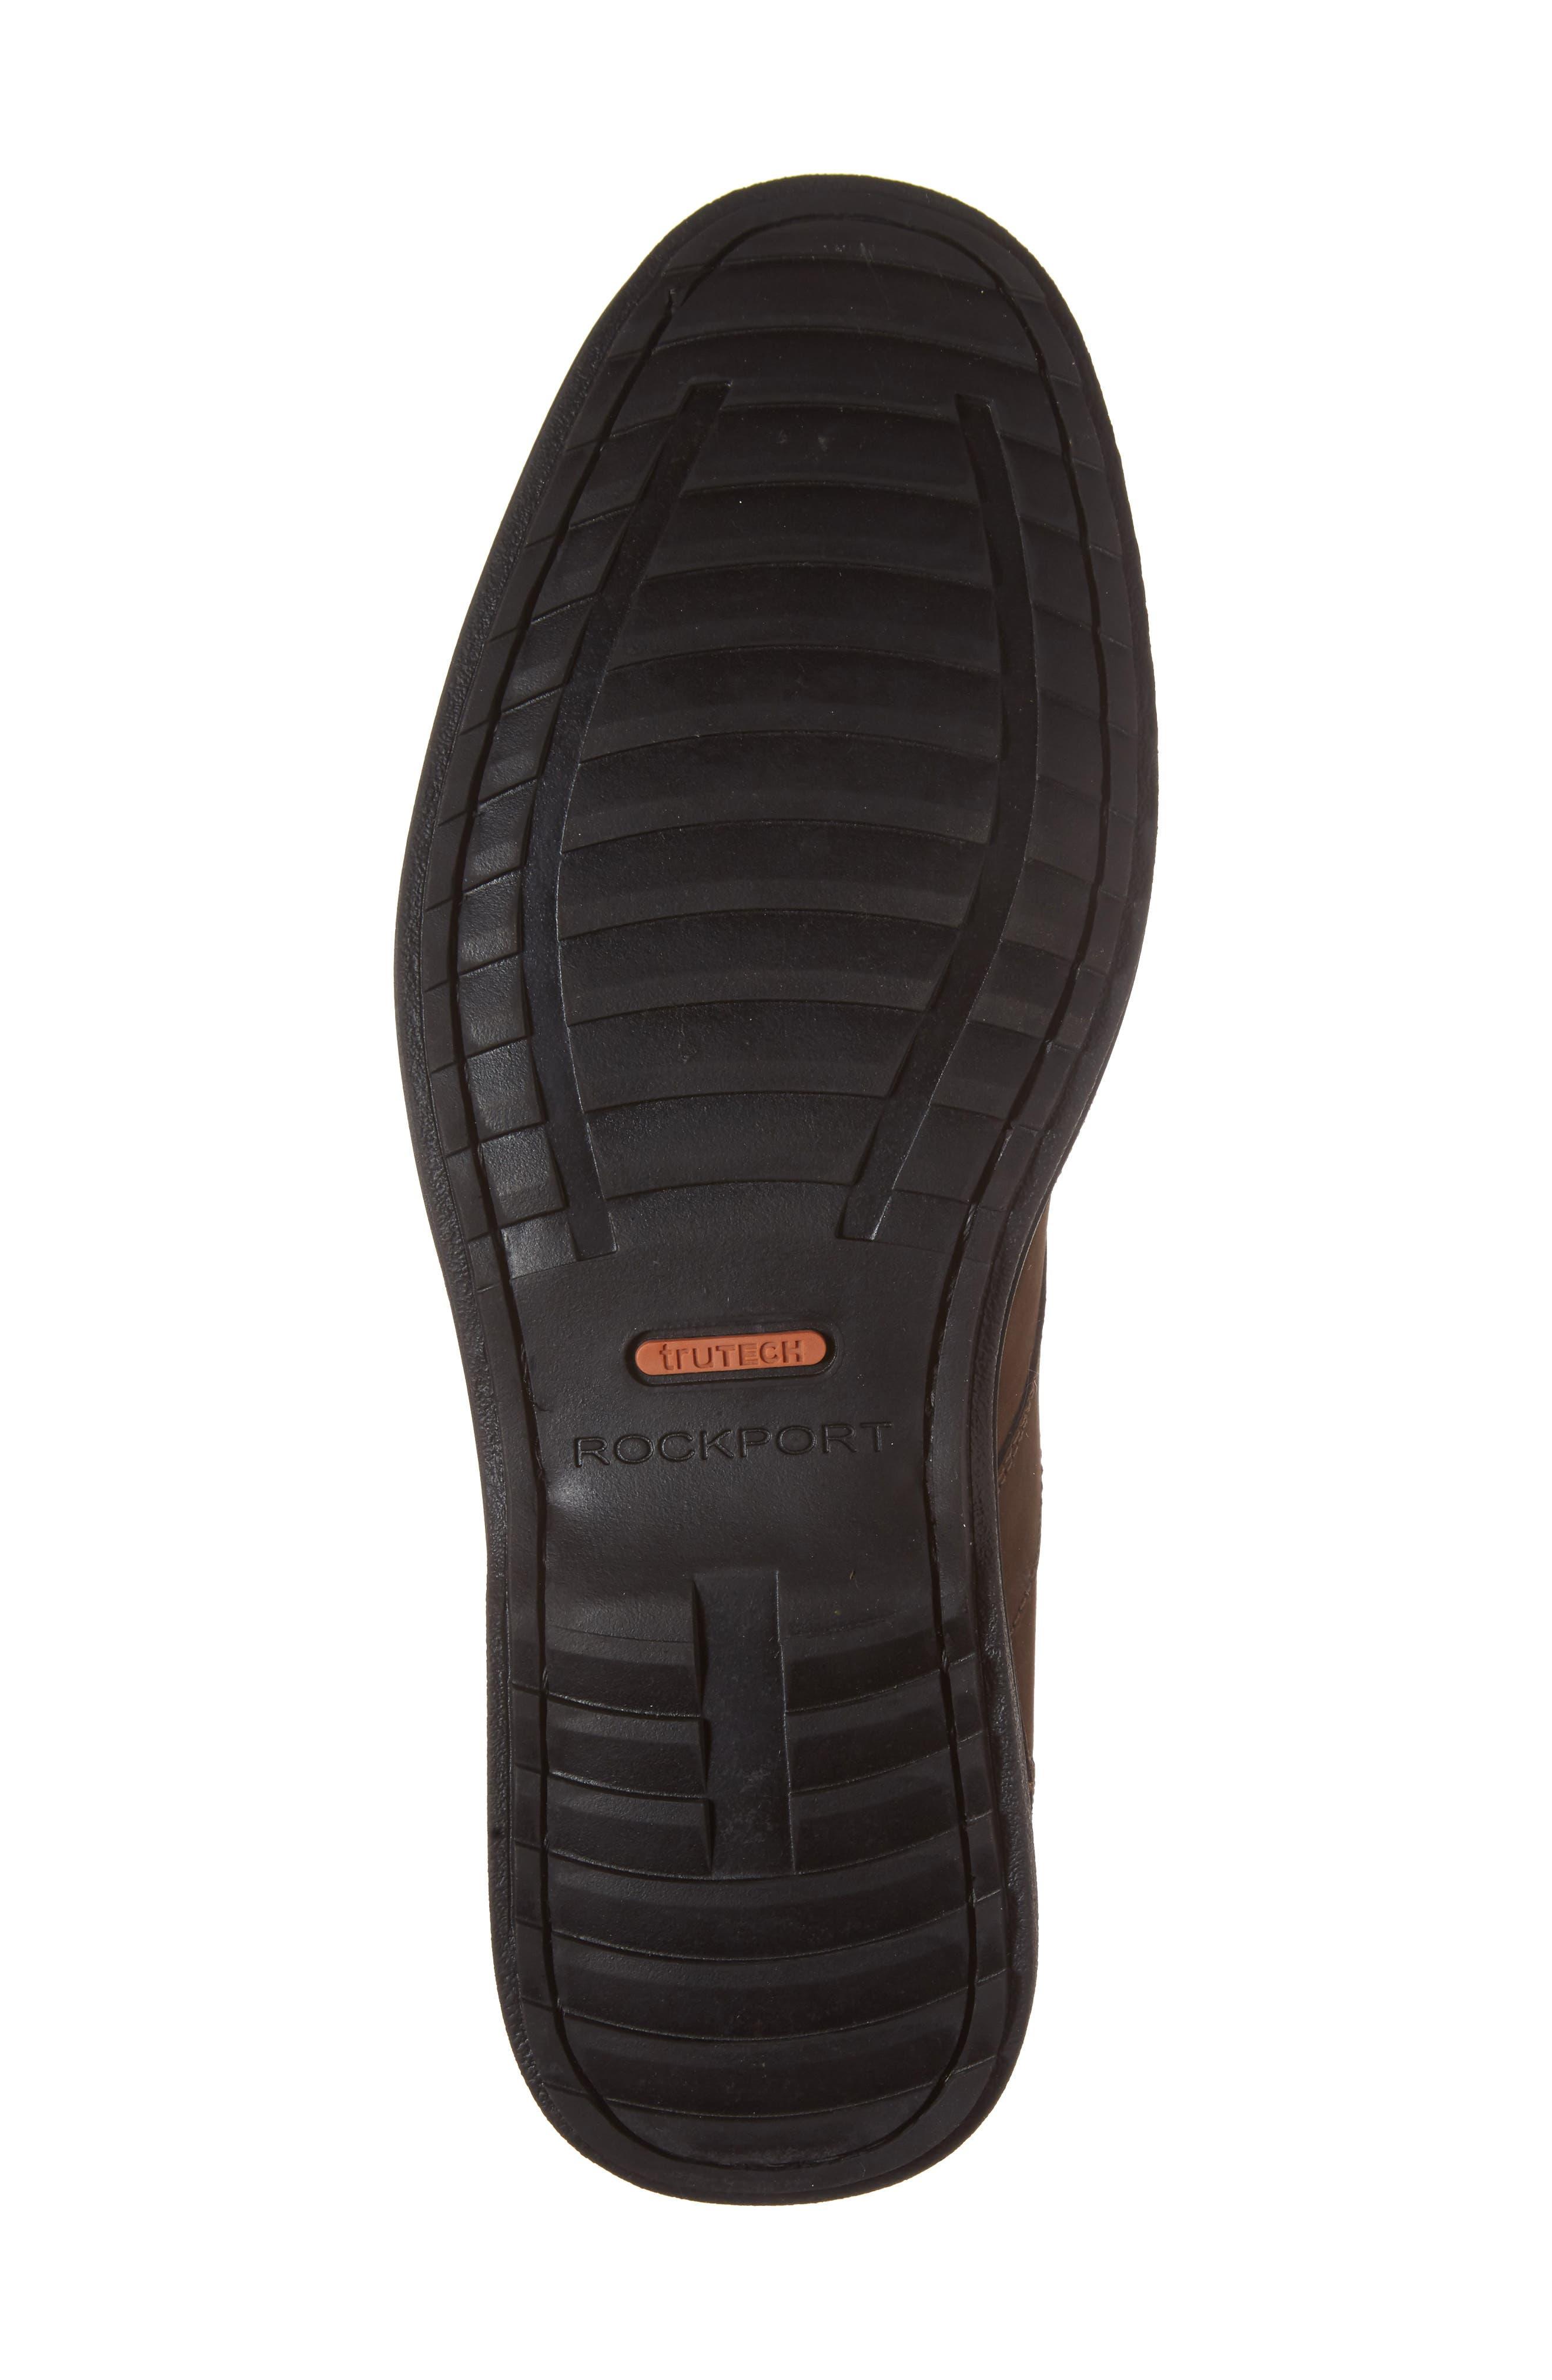 Premium Class Chukka Boot,                             Alternate thumbnail 6, color,                             Brown Nubuck